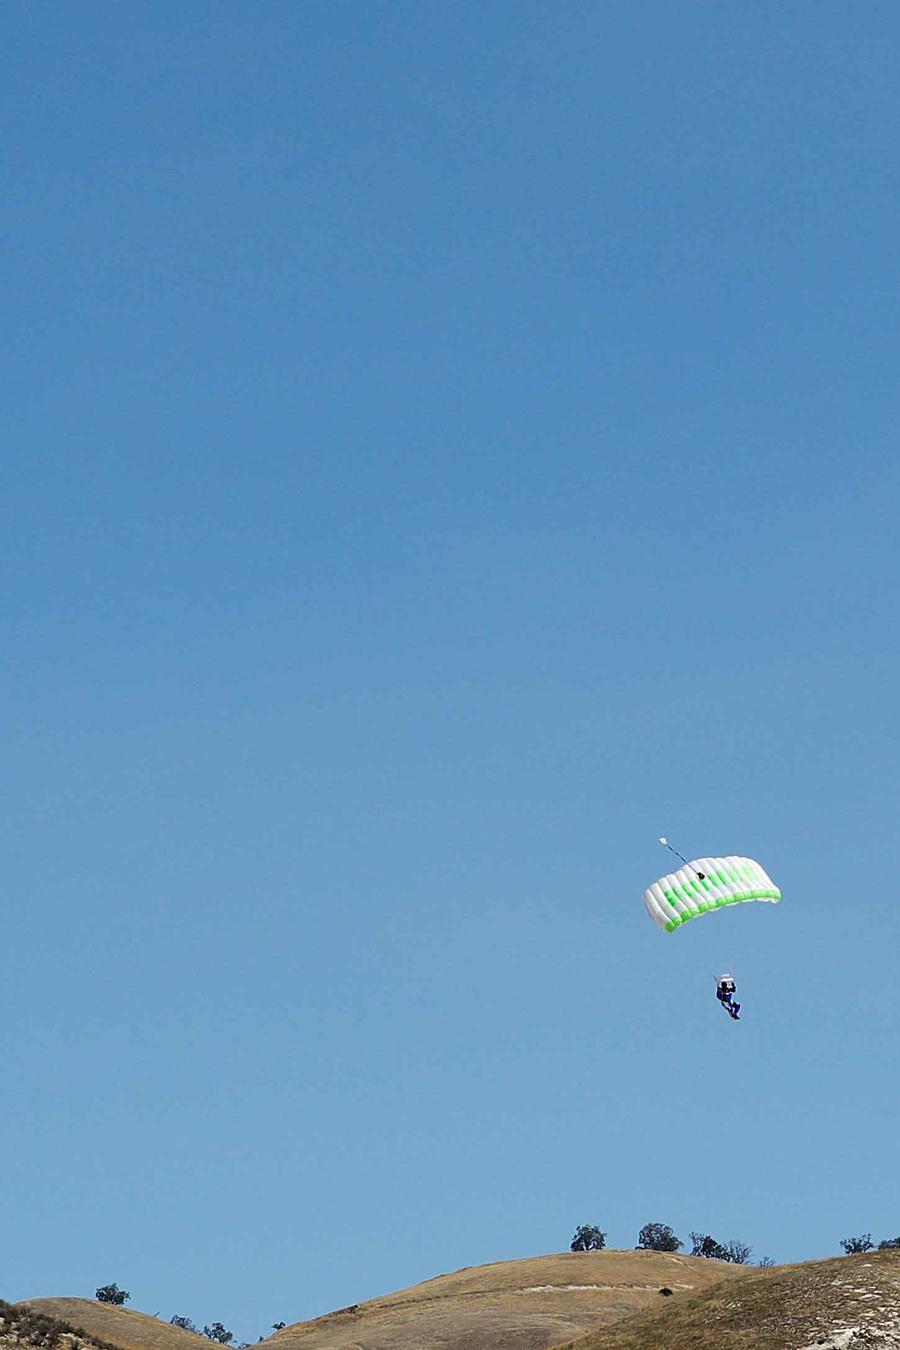 hombre se dispone a saltar sin paracaidas